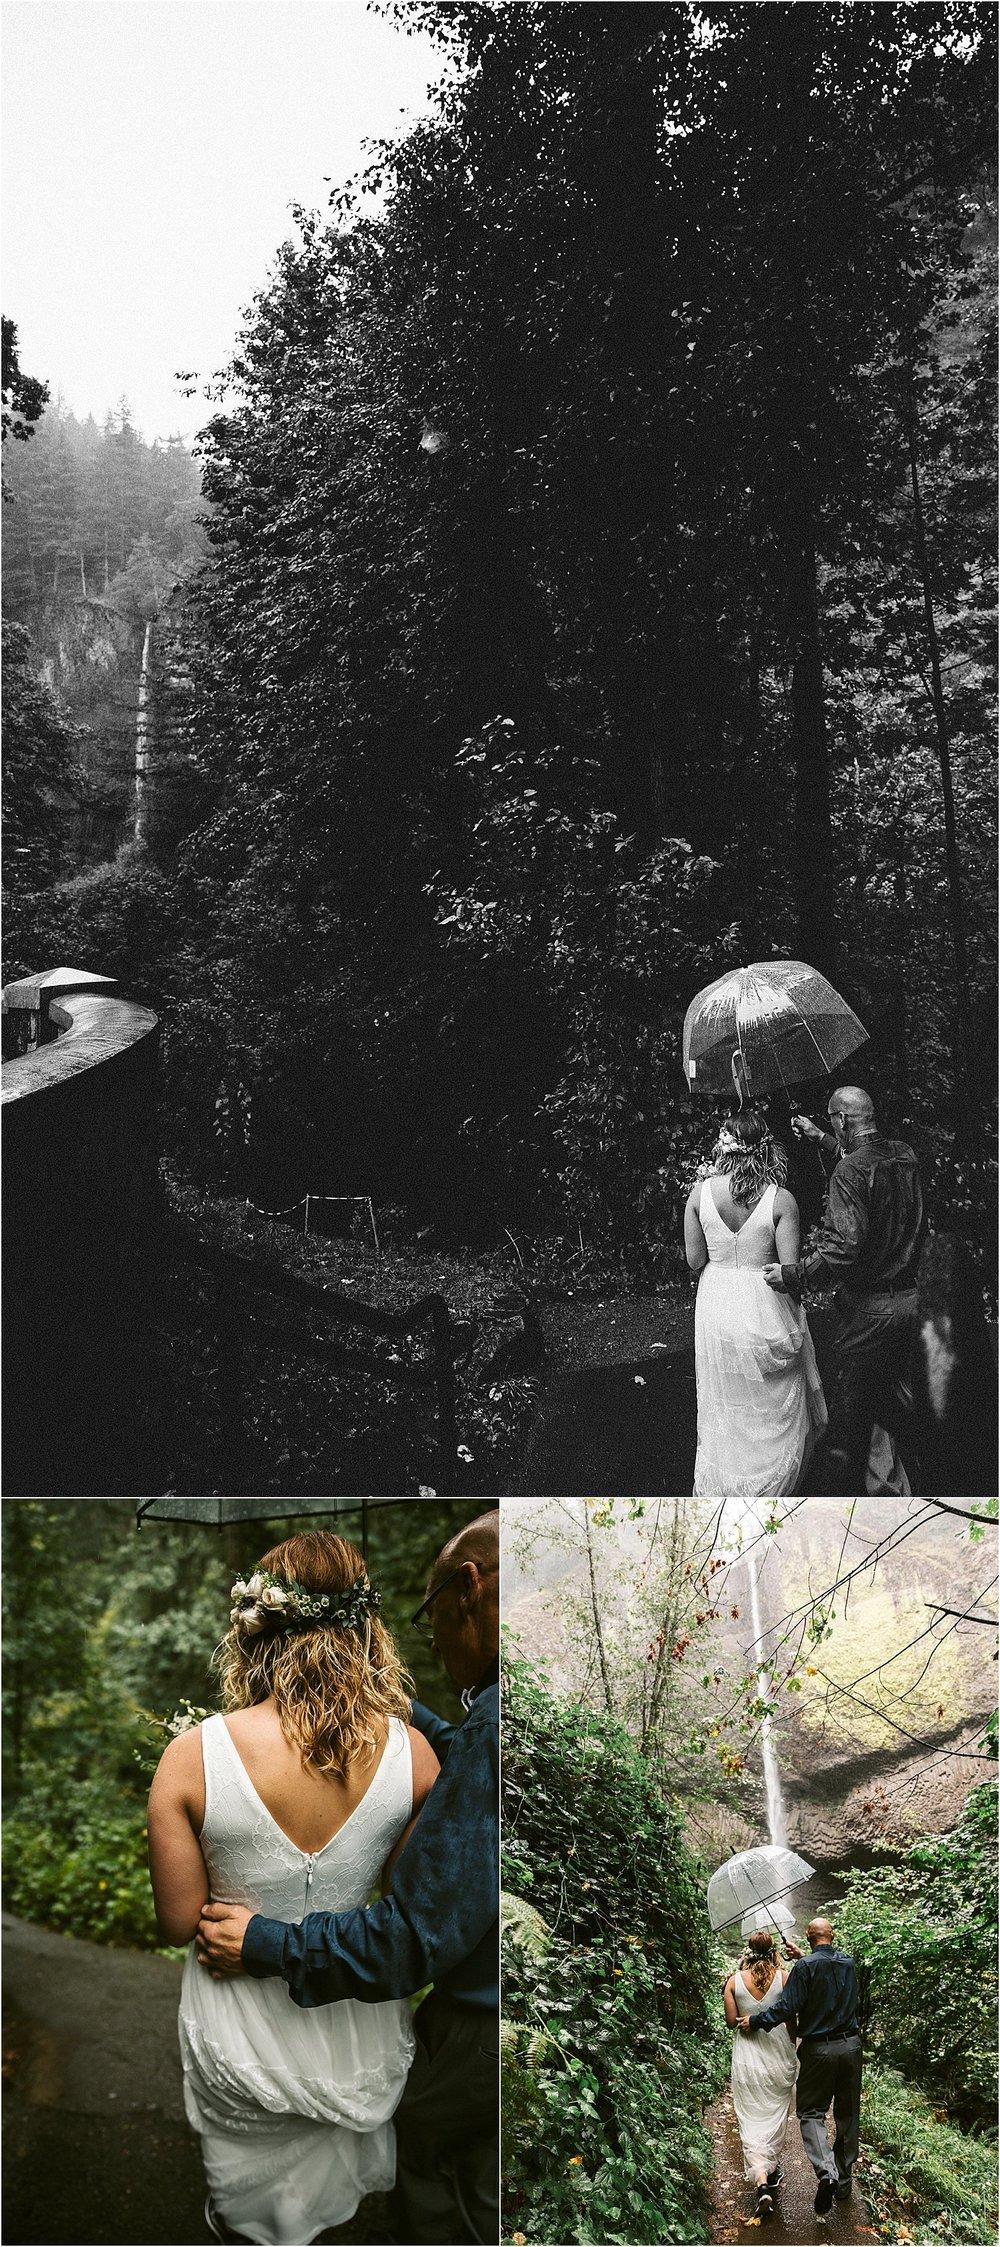 OregonWaterfallElopement-8.jpg